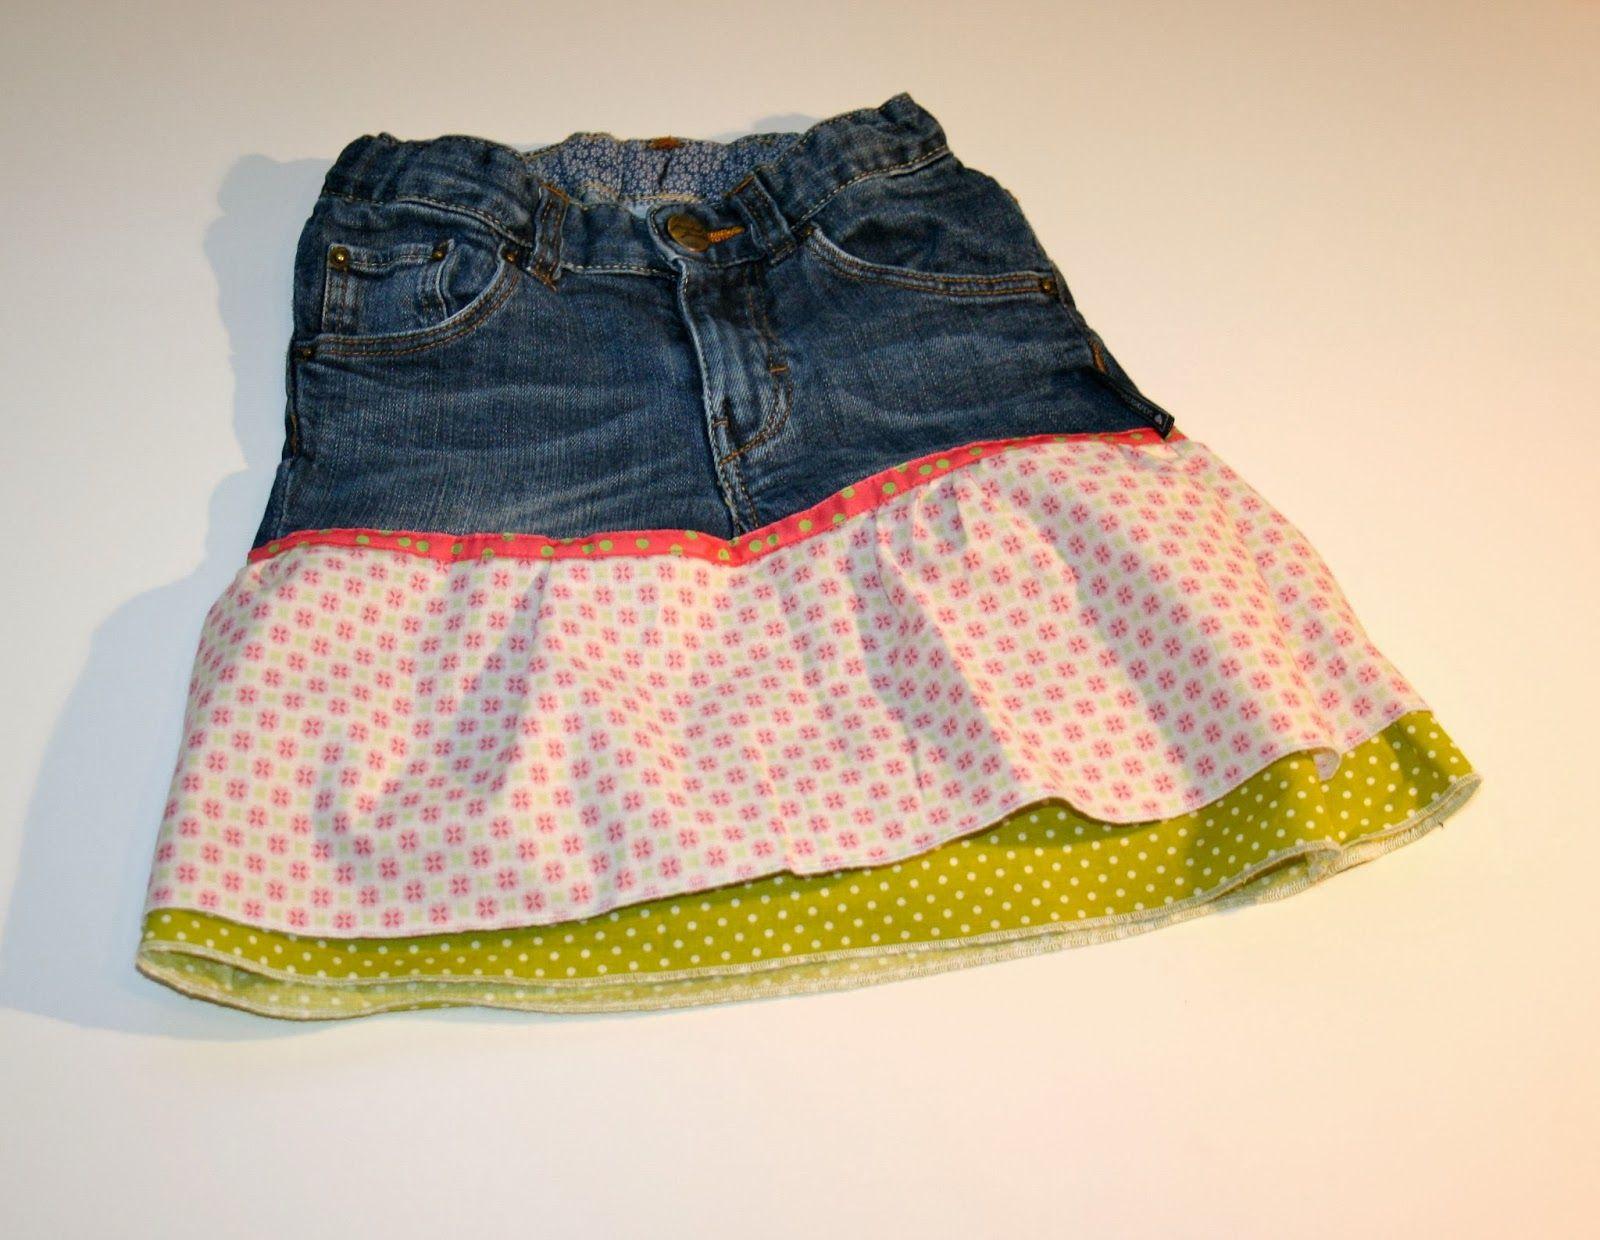 47388a2a22df Rosa Recycling | Nähen | Kinderkleid nähen, Jeans nähen und Hose nähen